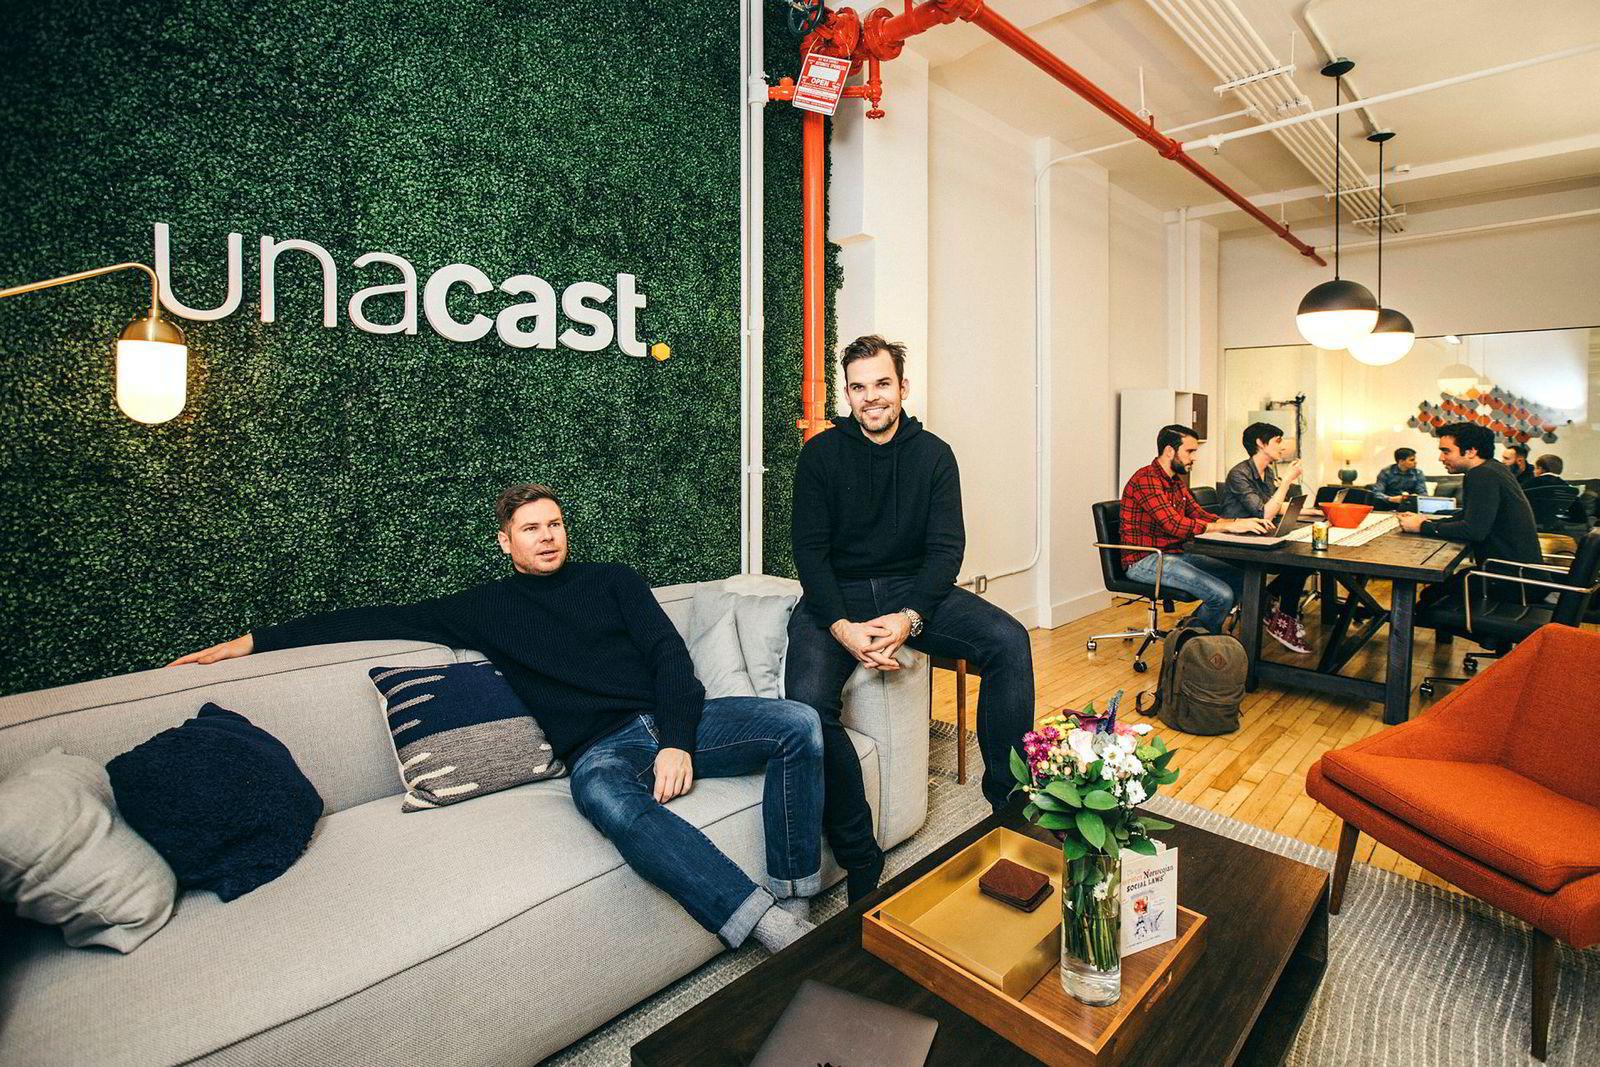 Kjartan Slette og Thomas Walle på Unacasts kontor, rett rundt hjørnet for Empire State Building på Manhattan i New York.